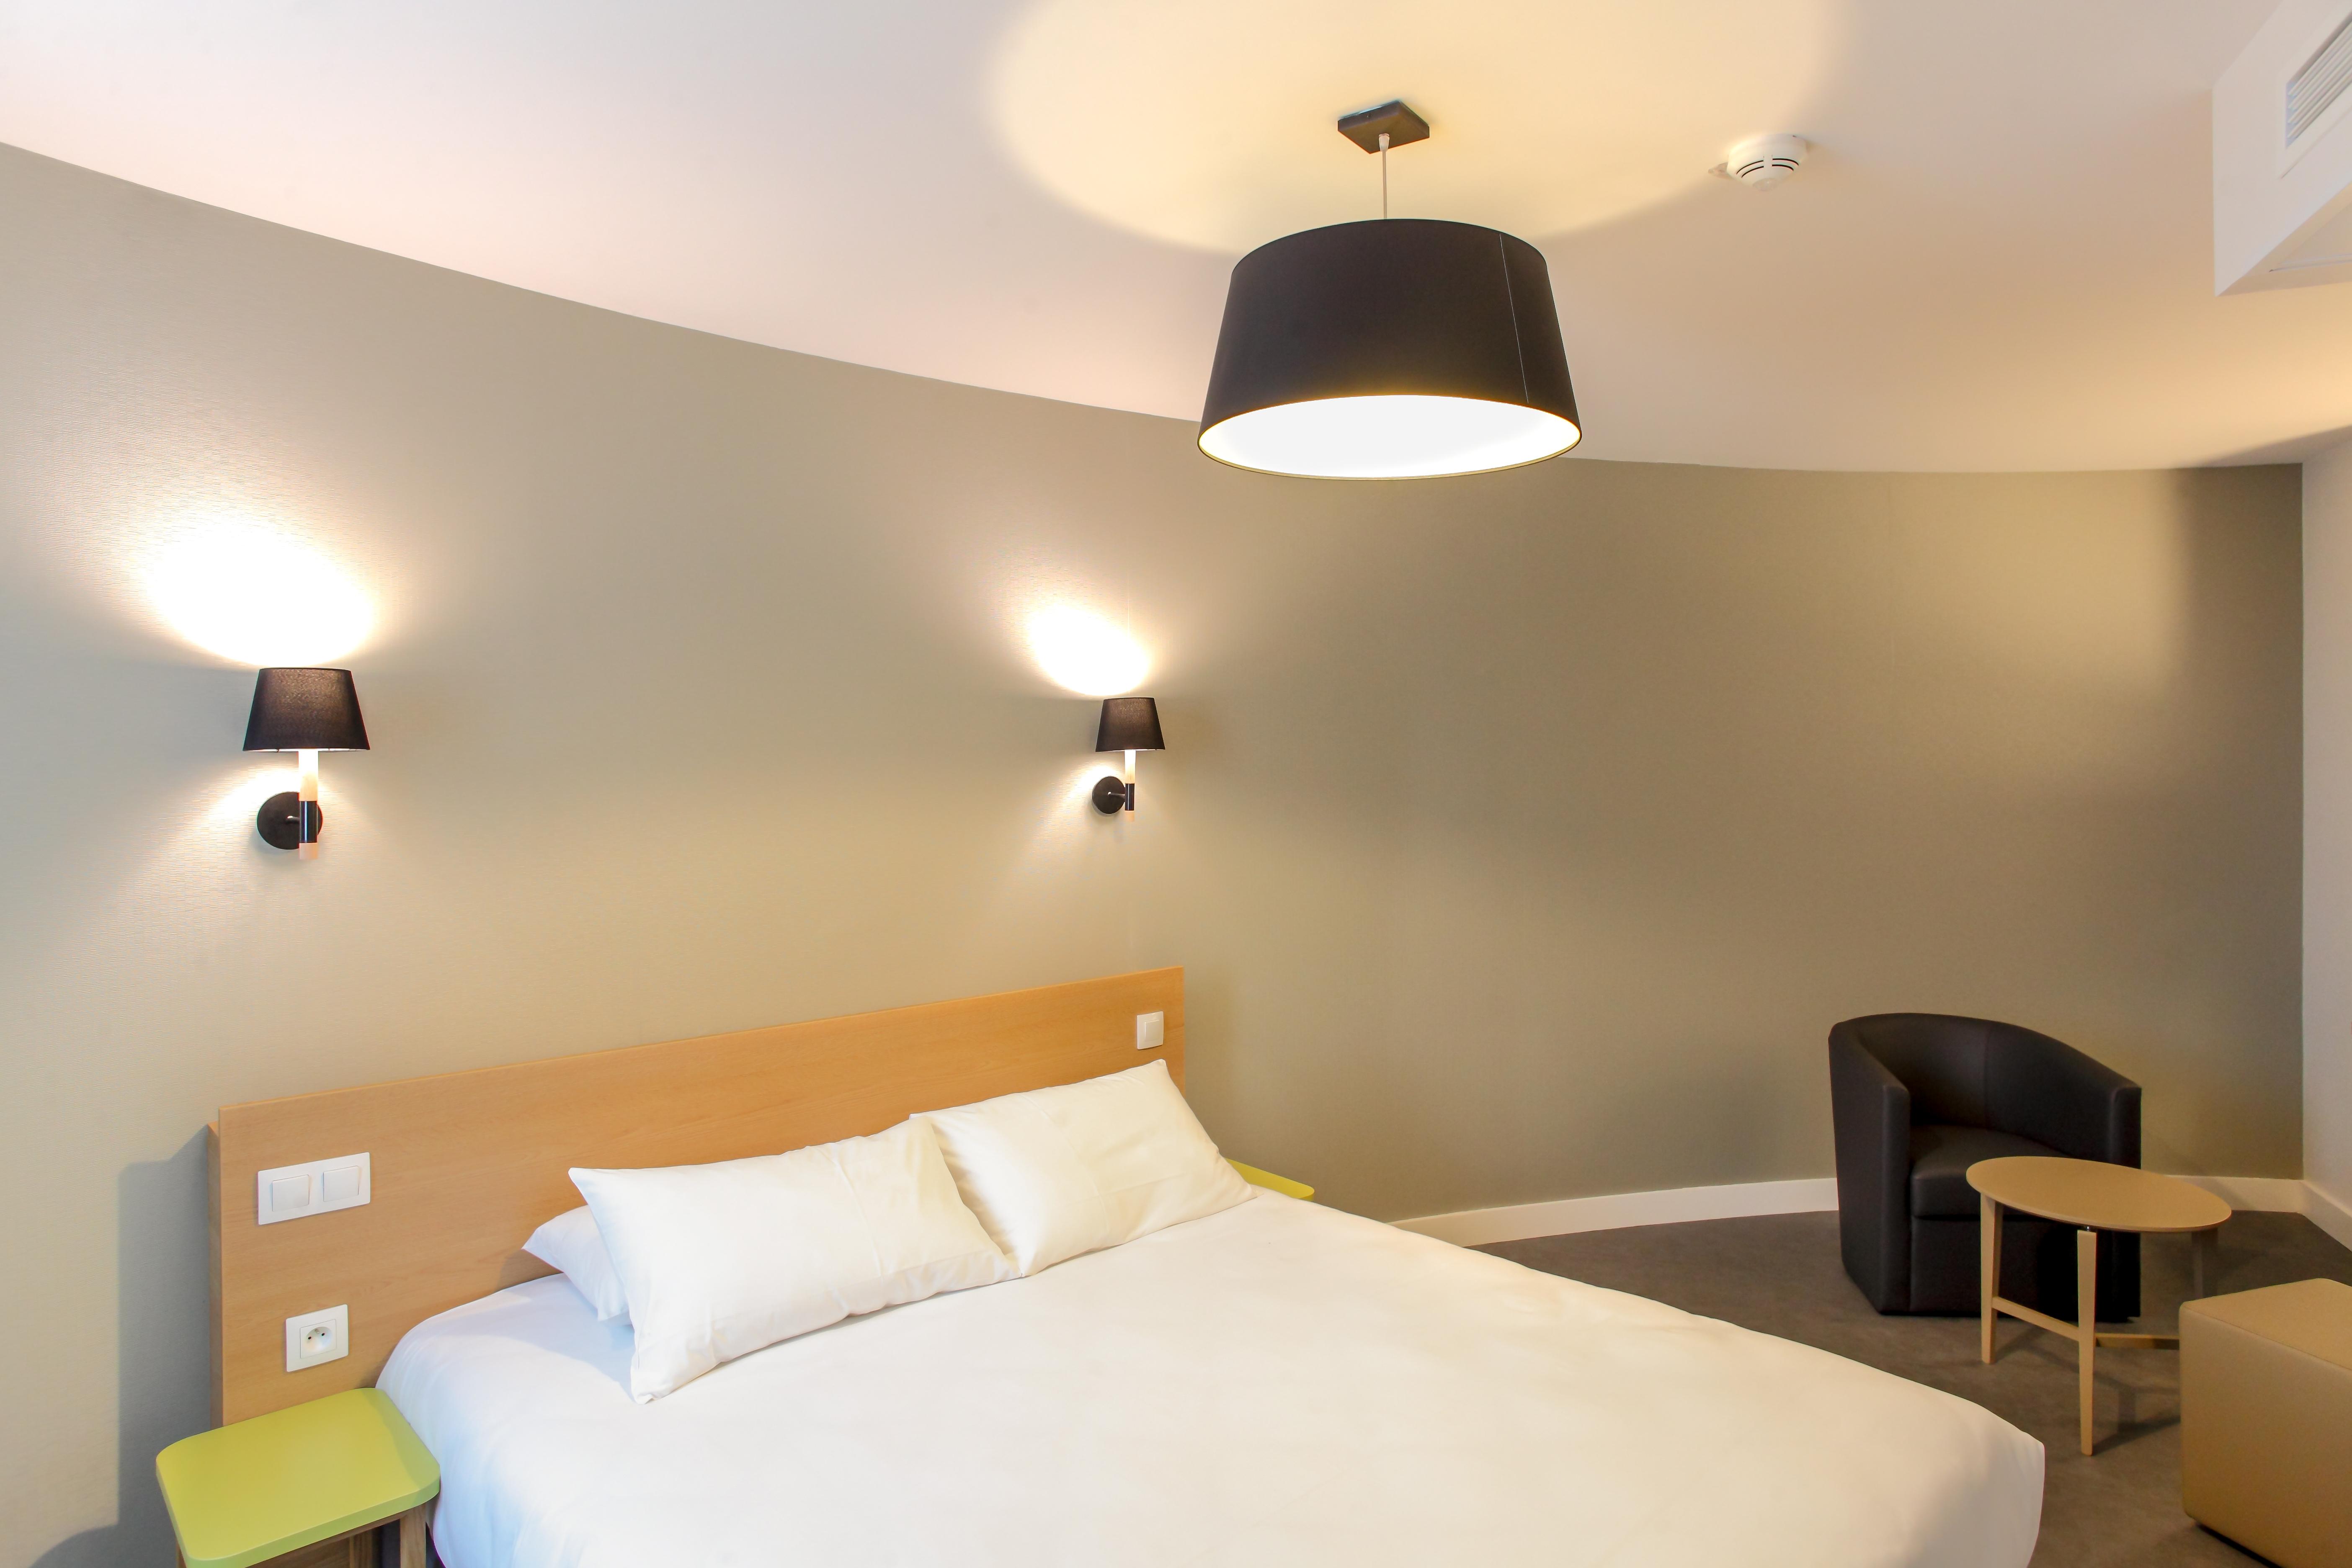 H tel reseda paris chambre ex cutive for Hotel paris chambre 4 personnes